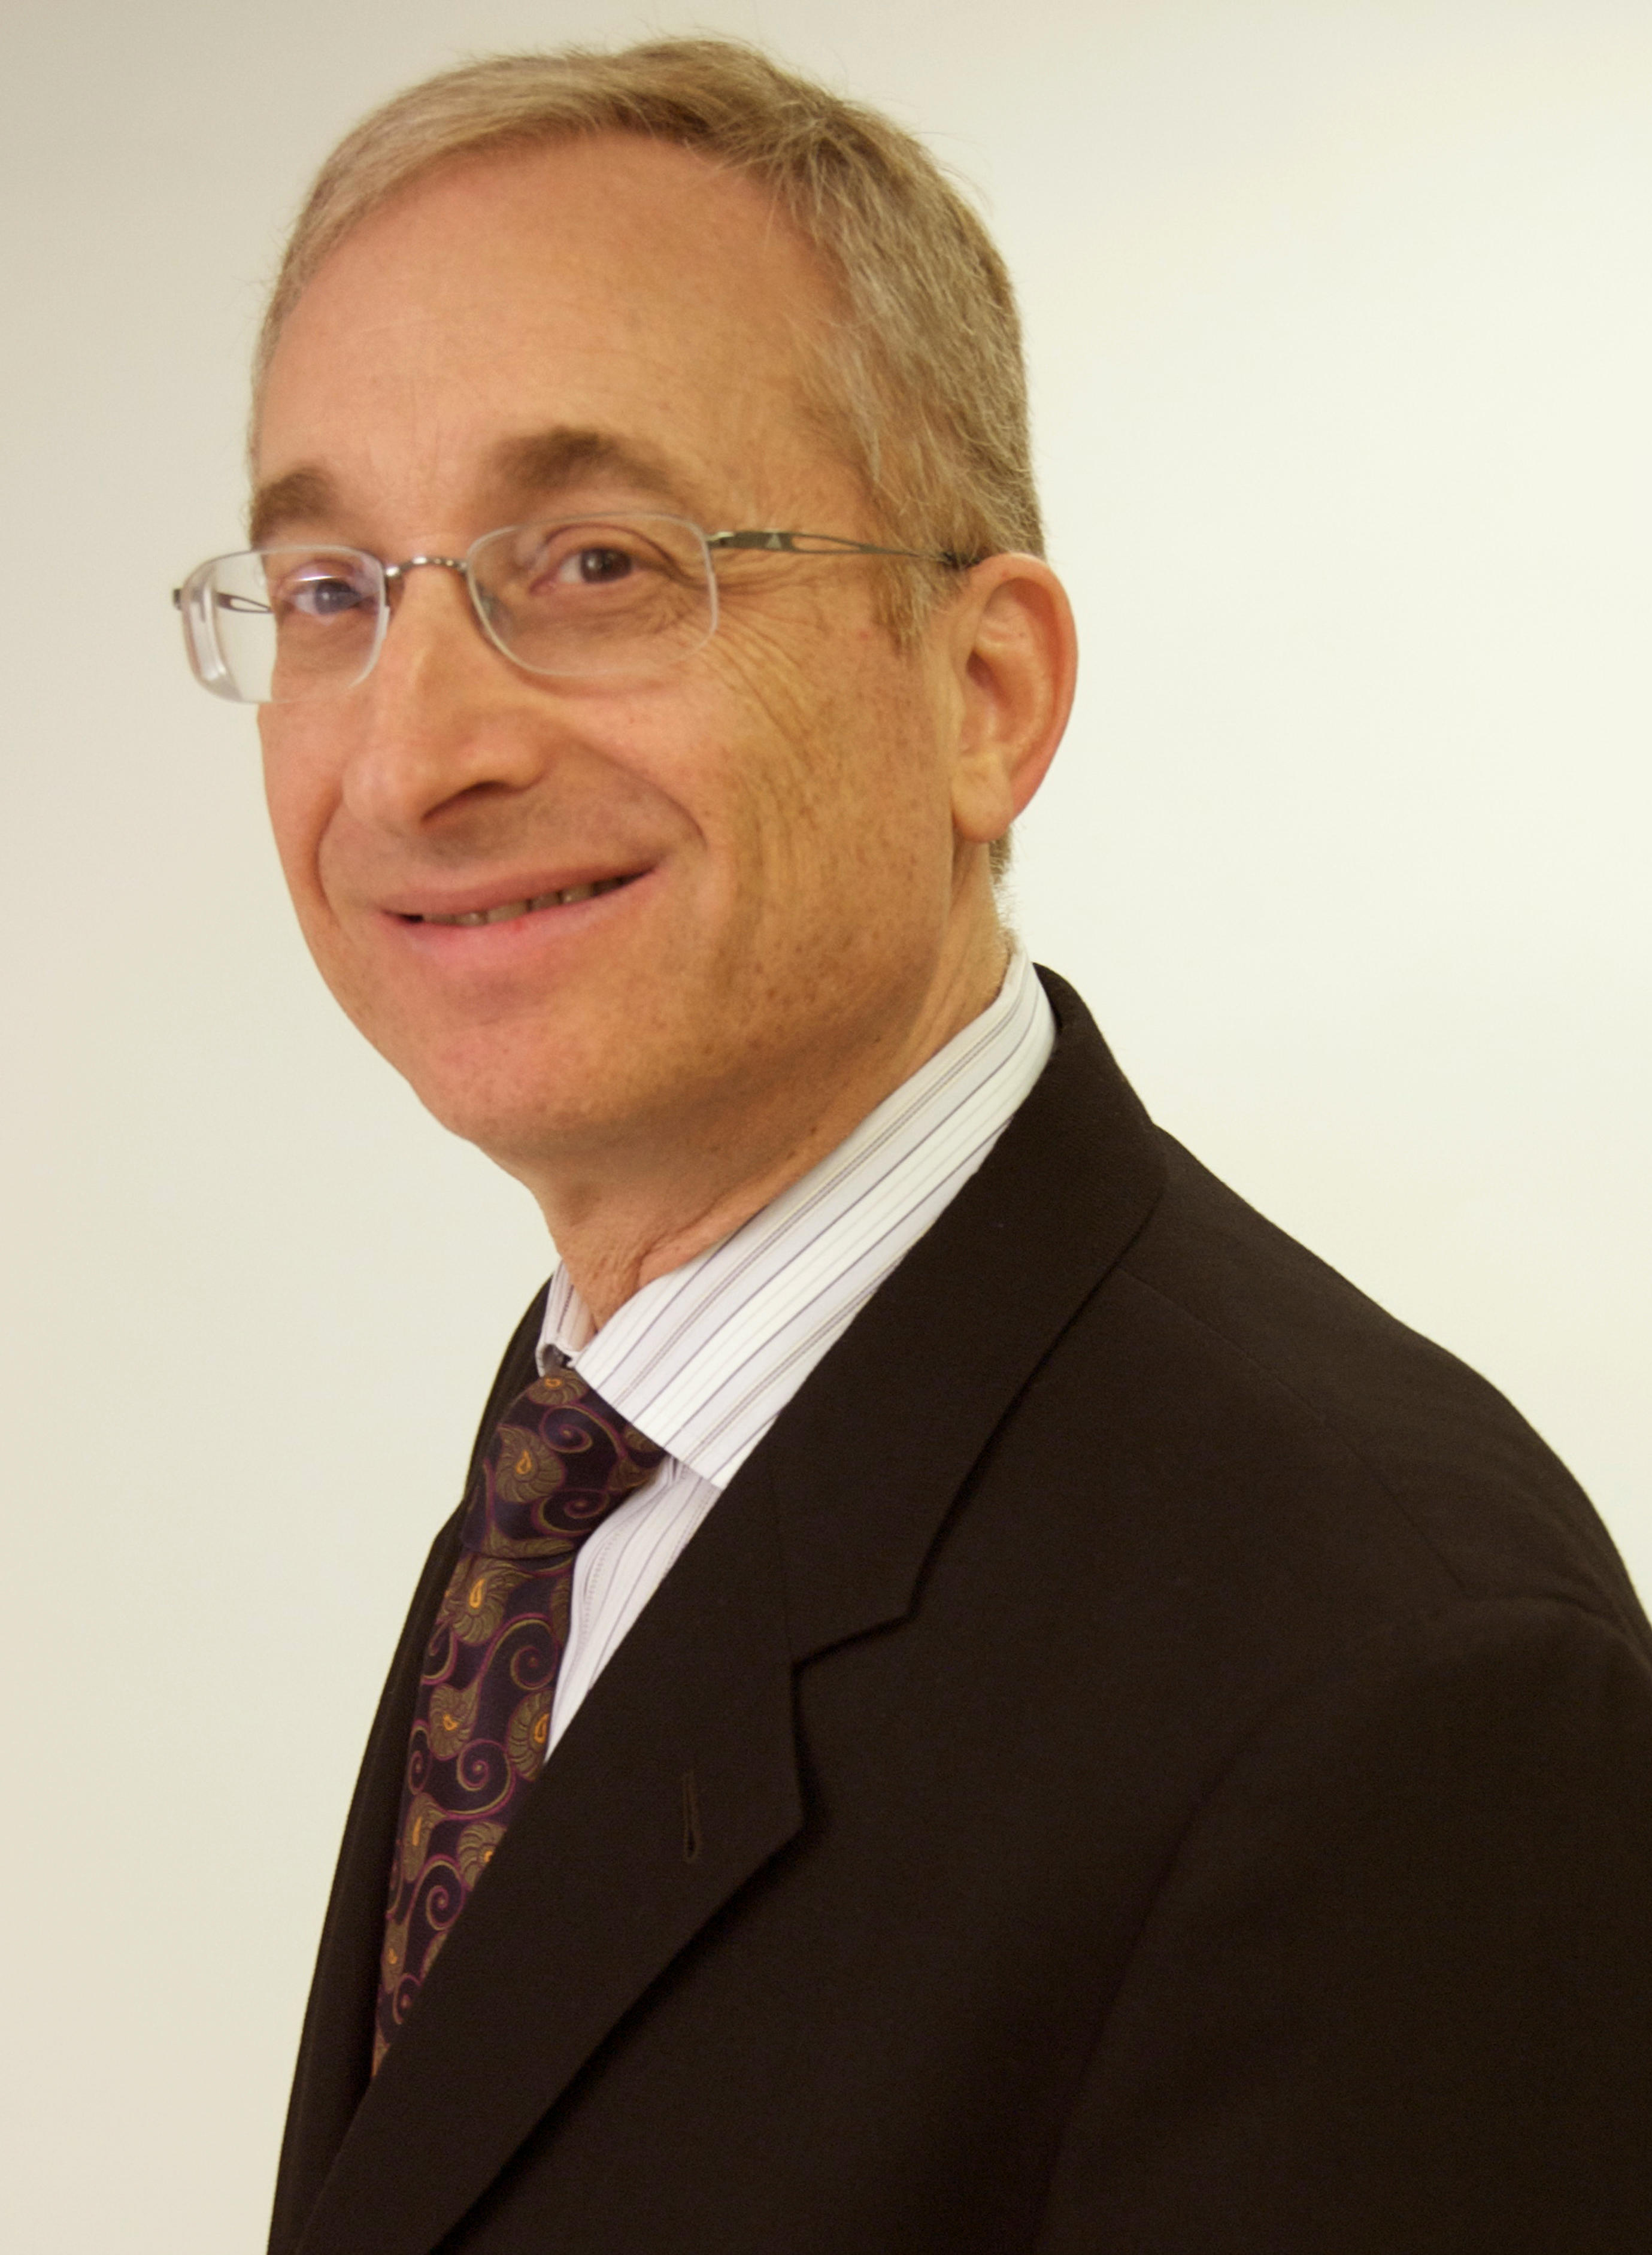 Irving H. Gomolin, MD